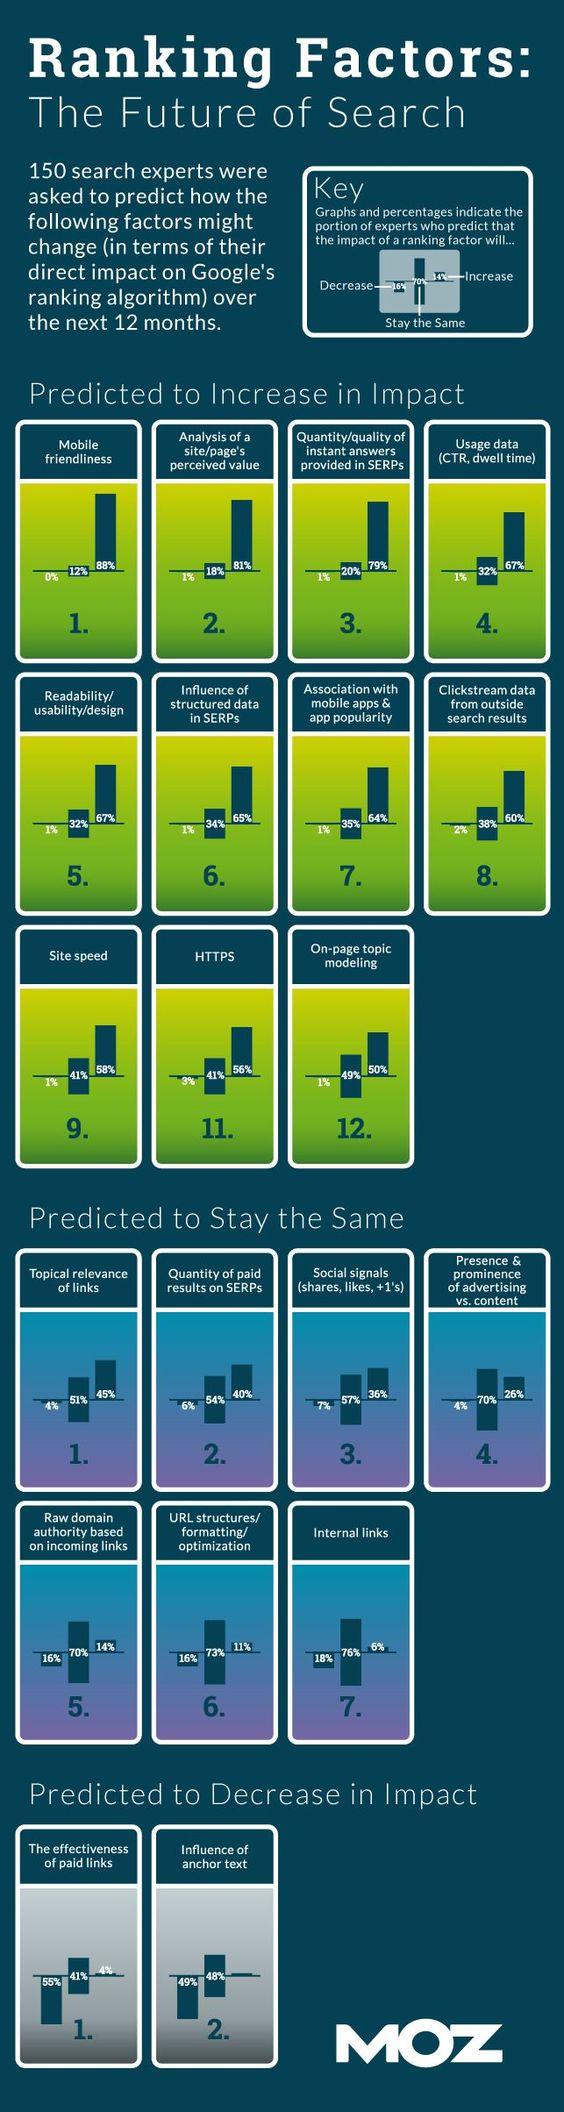 The Future of SEO: 2015 Ranking Factors Expert Survey Deep Dive